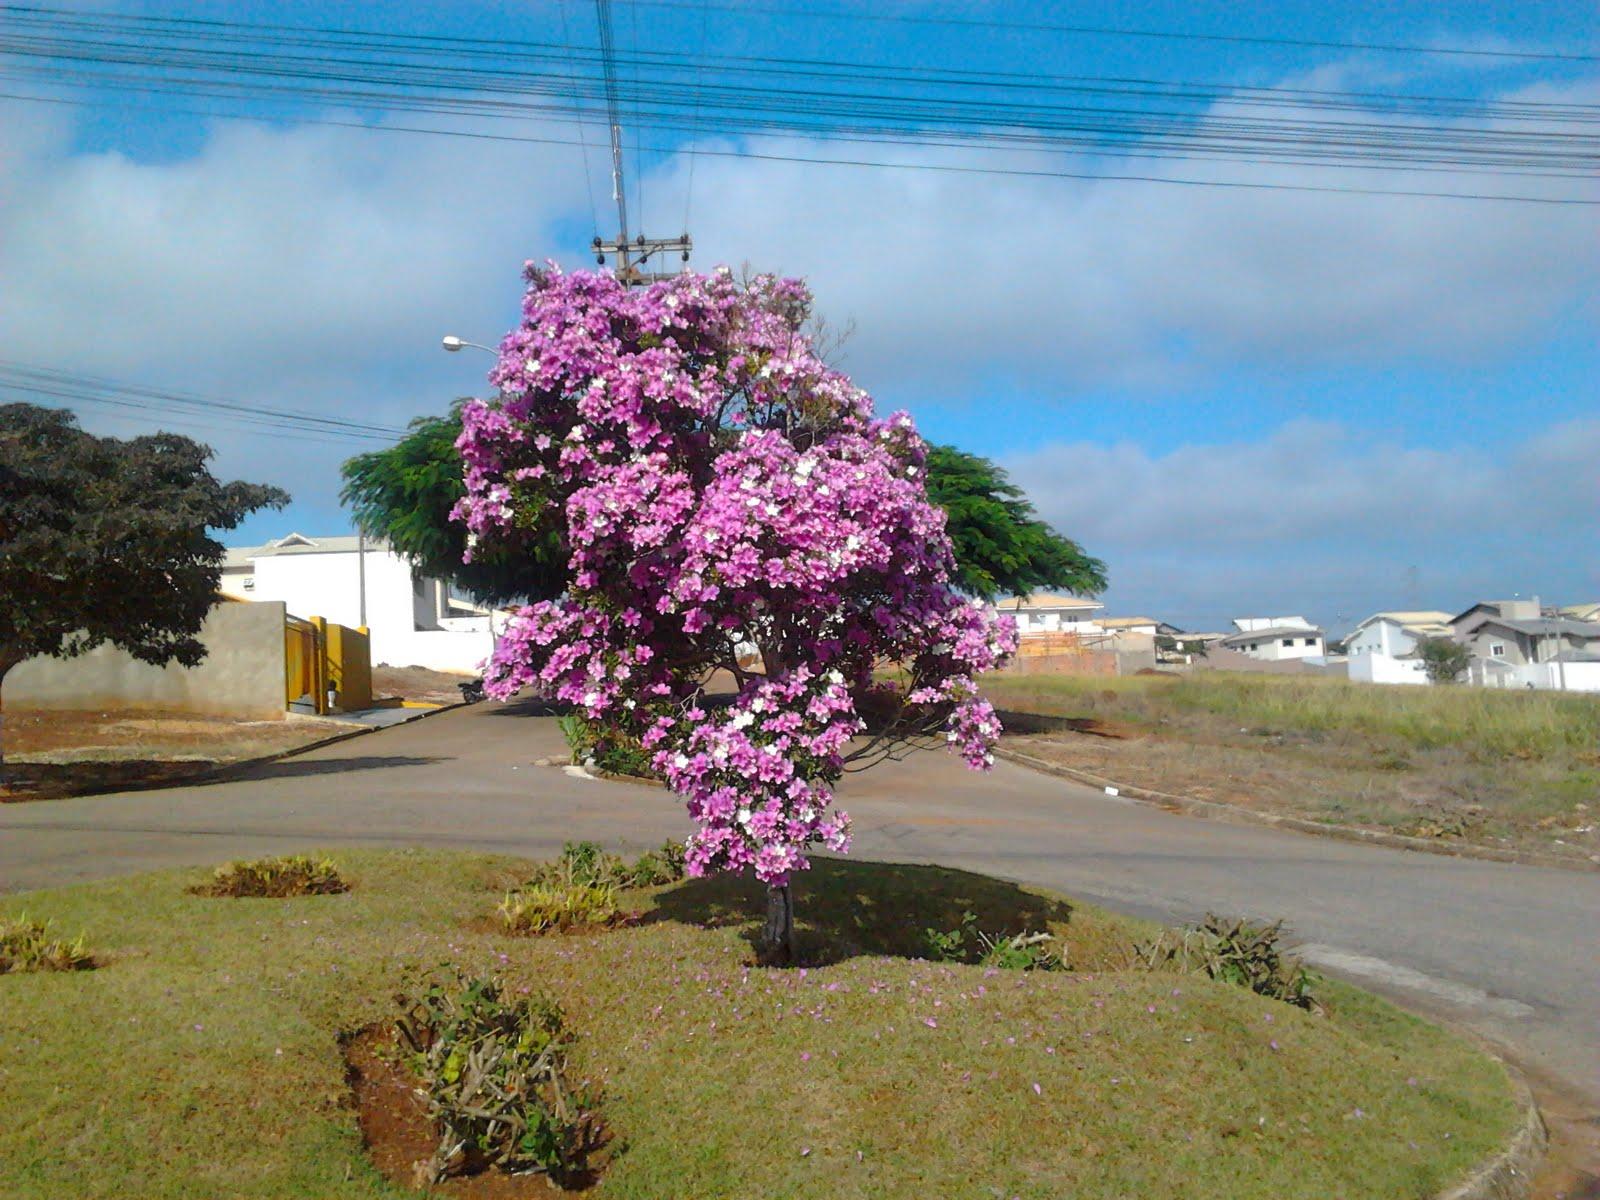 arvore manaca jardim: Blog de Itapeva: Manacá em flor, no Jardim Ferrari 3, Itapeva(SP